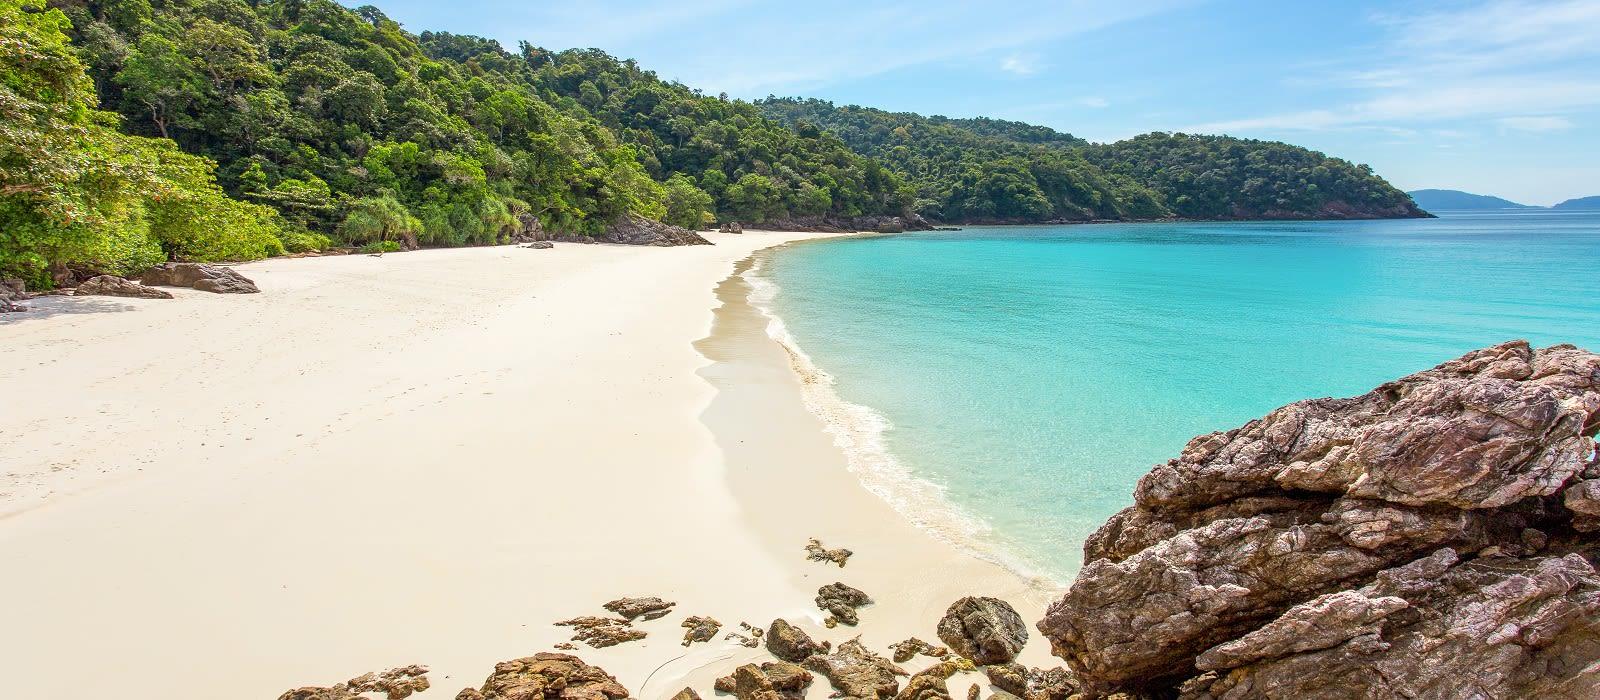 Destination Southern Mergui Archipelago Myanmar